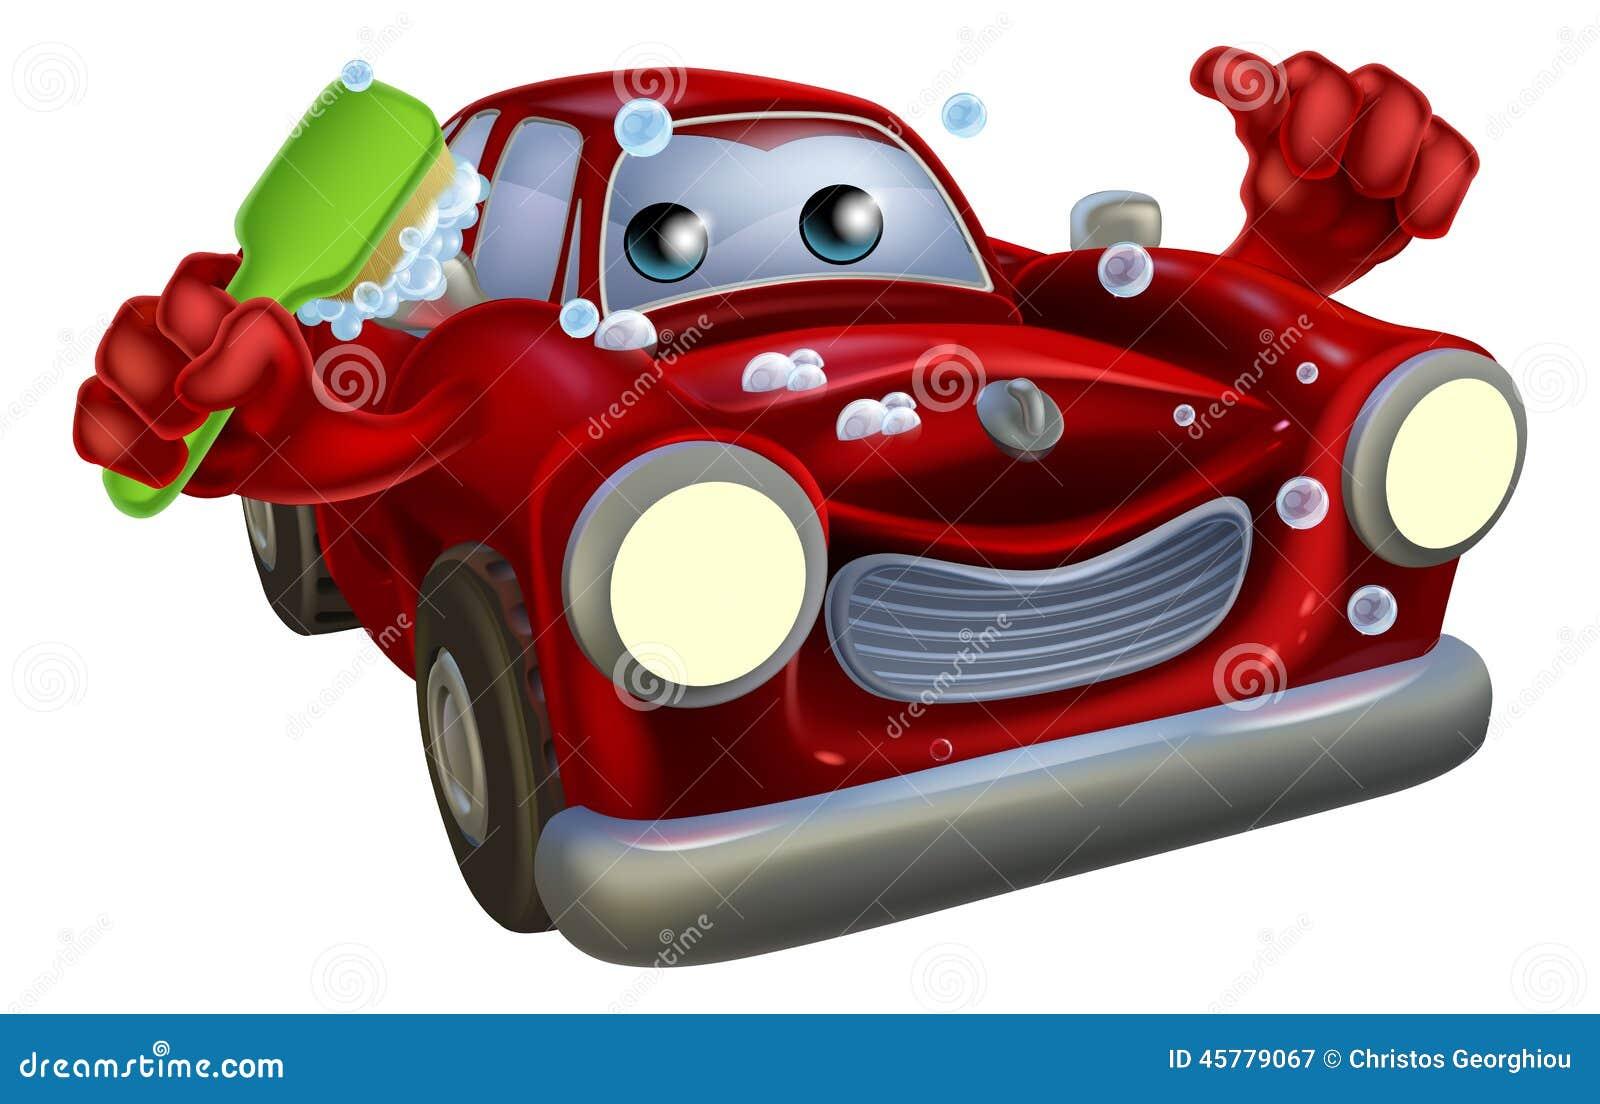 Car Wash Brush >> Car Valet Cartoon Stock Vector - Image: 45779067